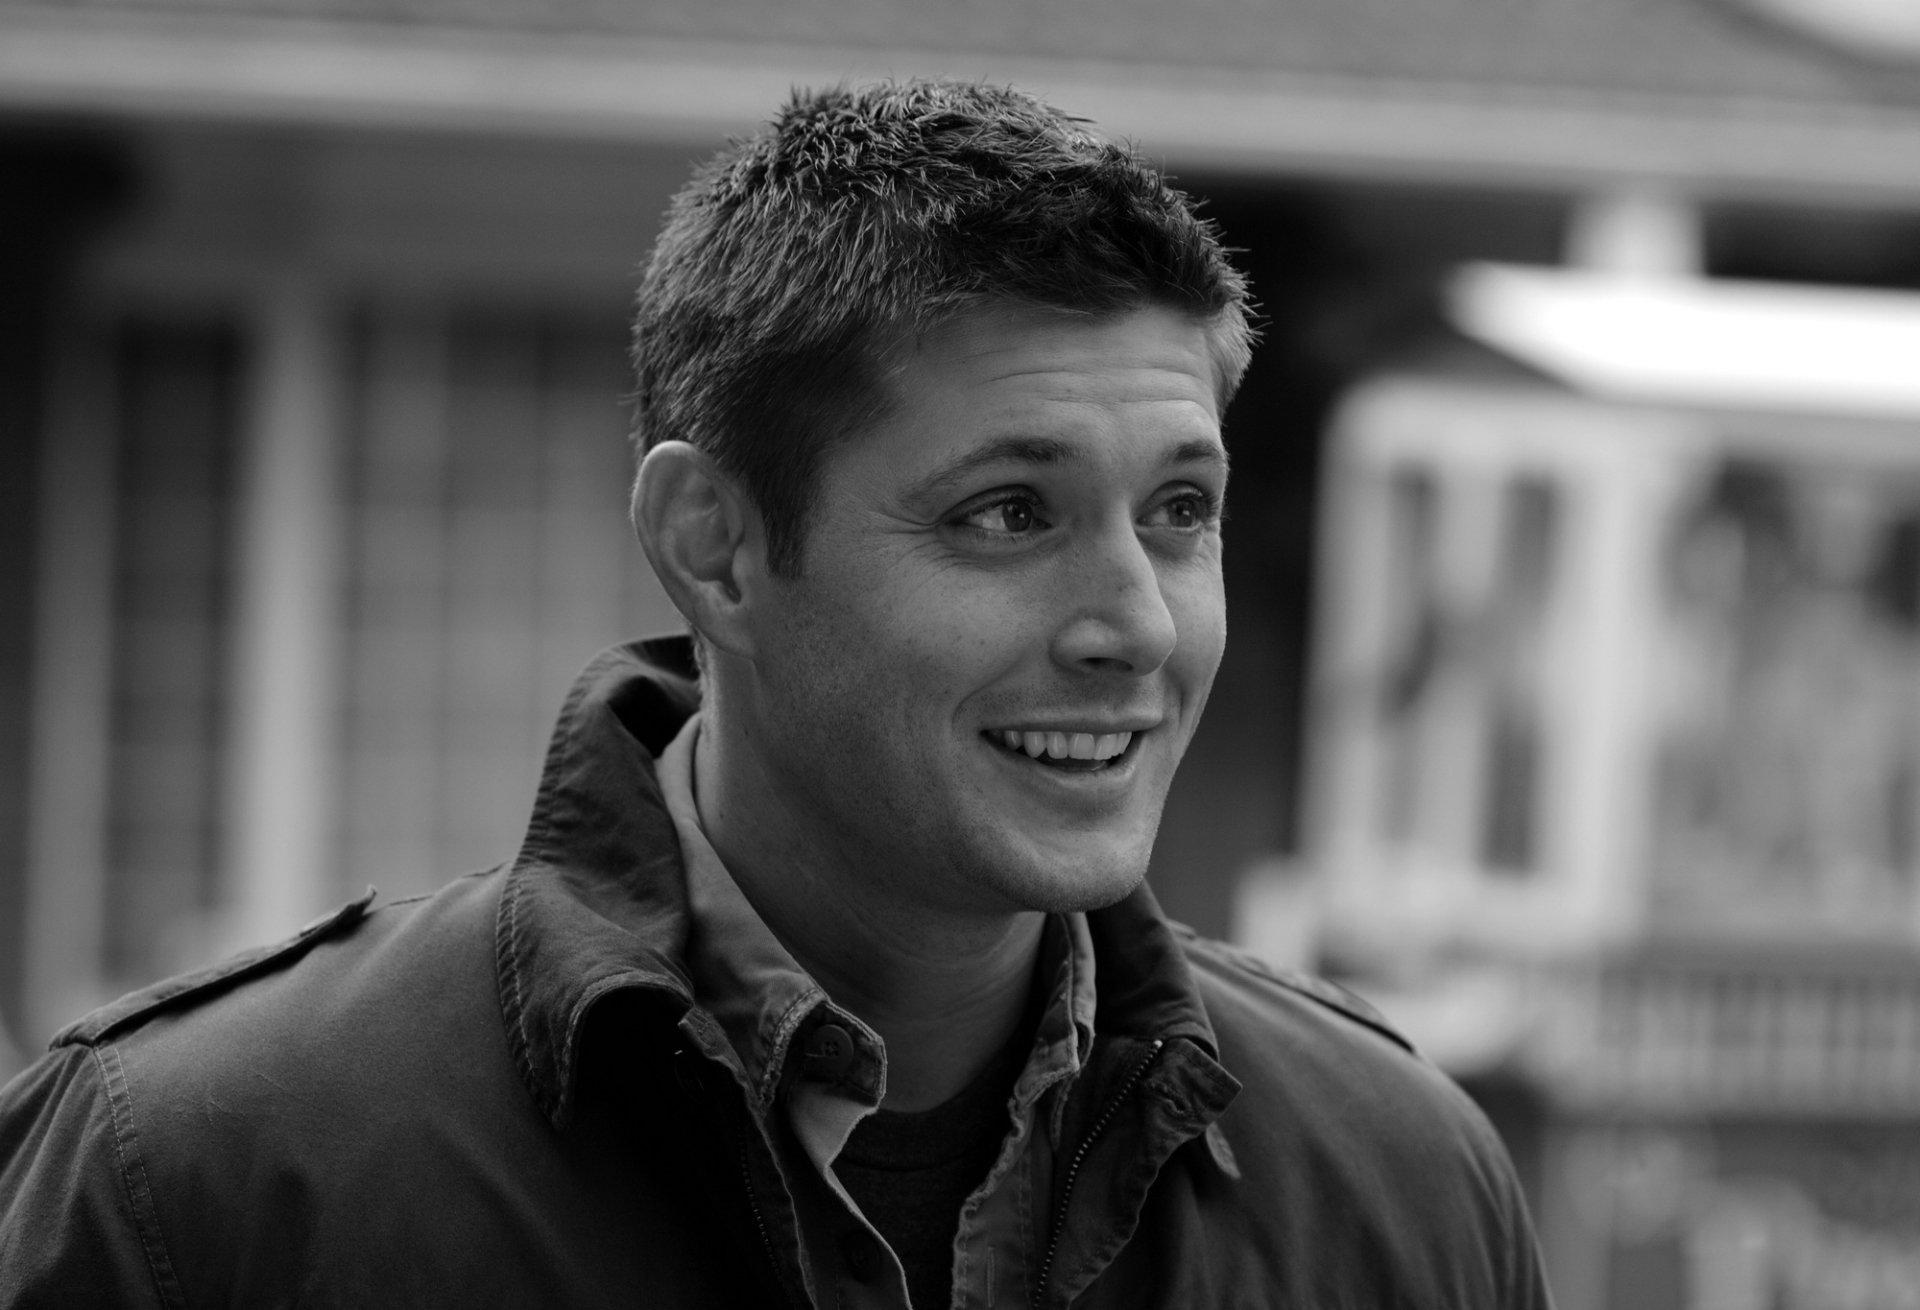 名人 - Jensen Ackles  壁纸